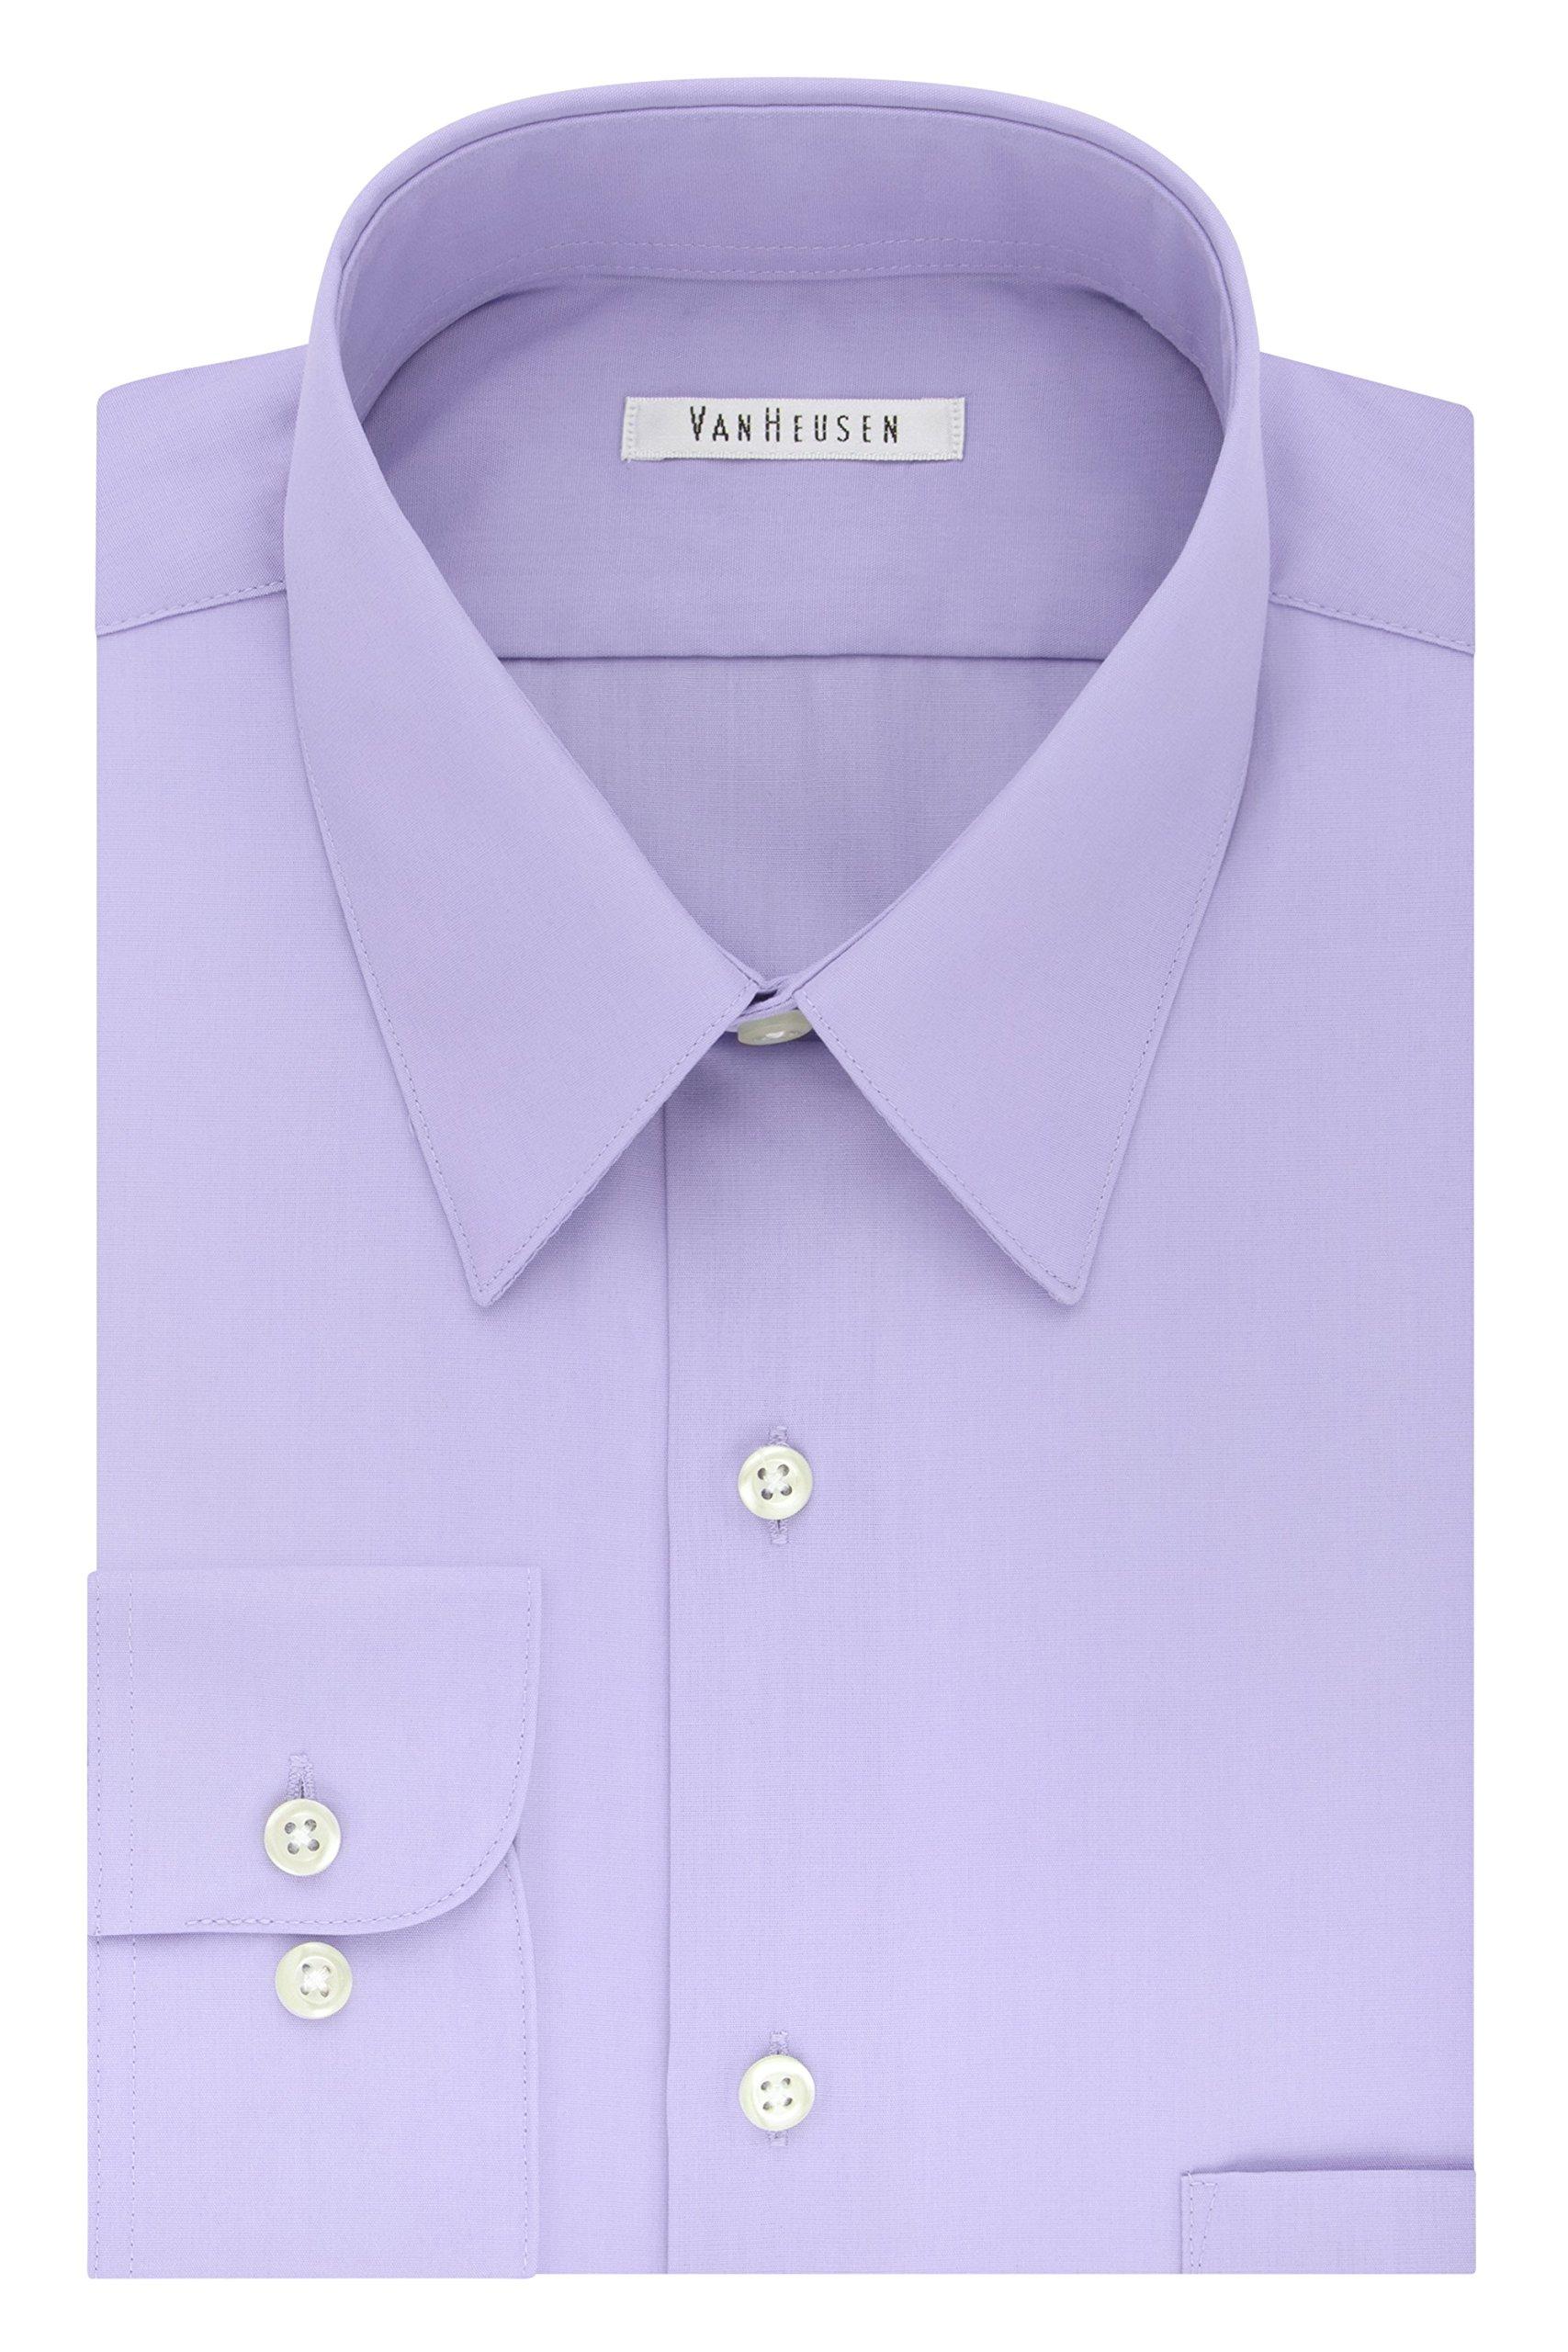 Van Heusen Men's Tall Size Big Dress Shirt Fit Poplin, Lavender, 22'' Neck 35''-36'' Sleeve